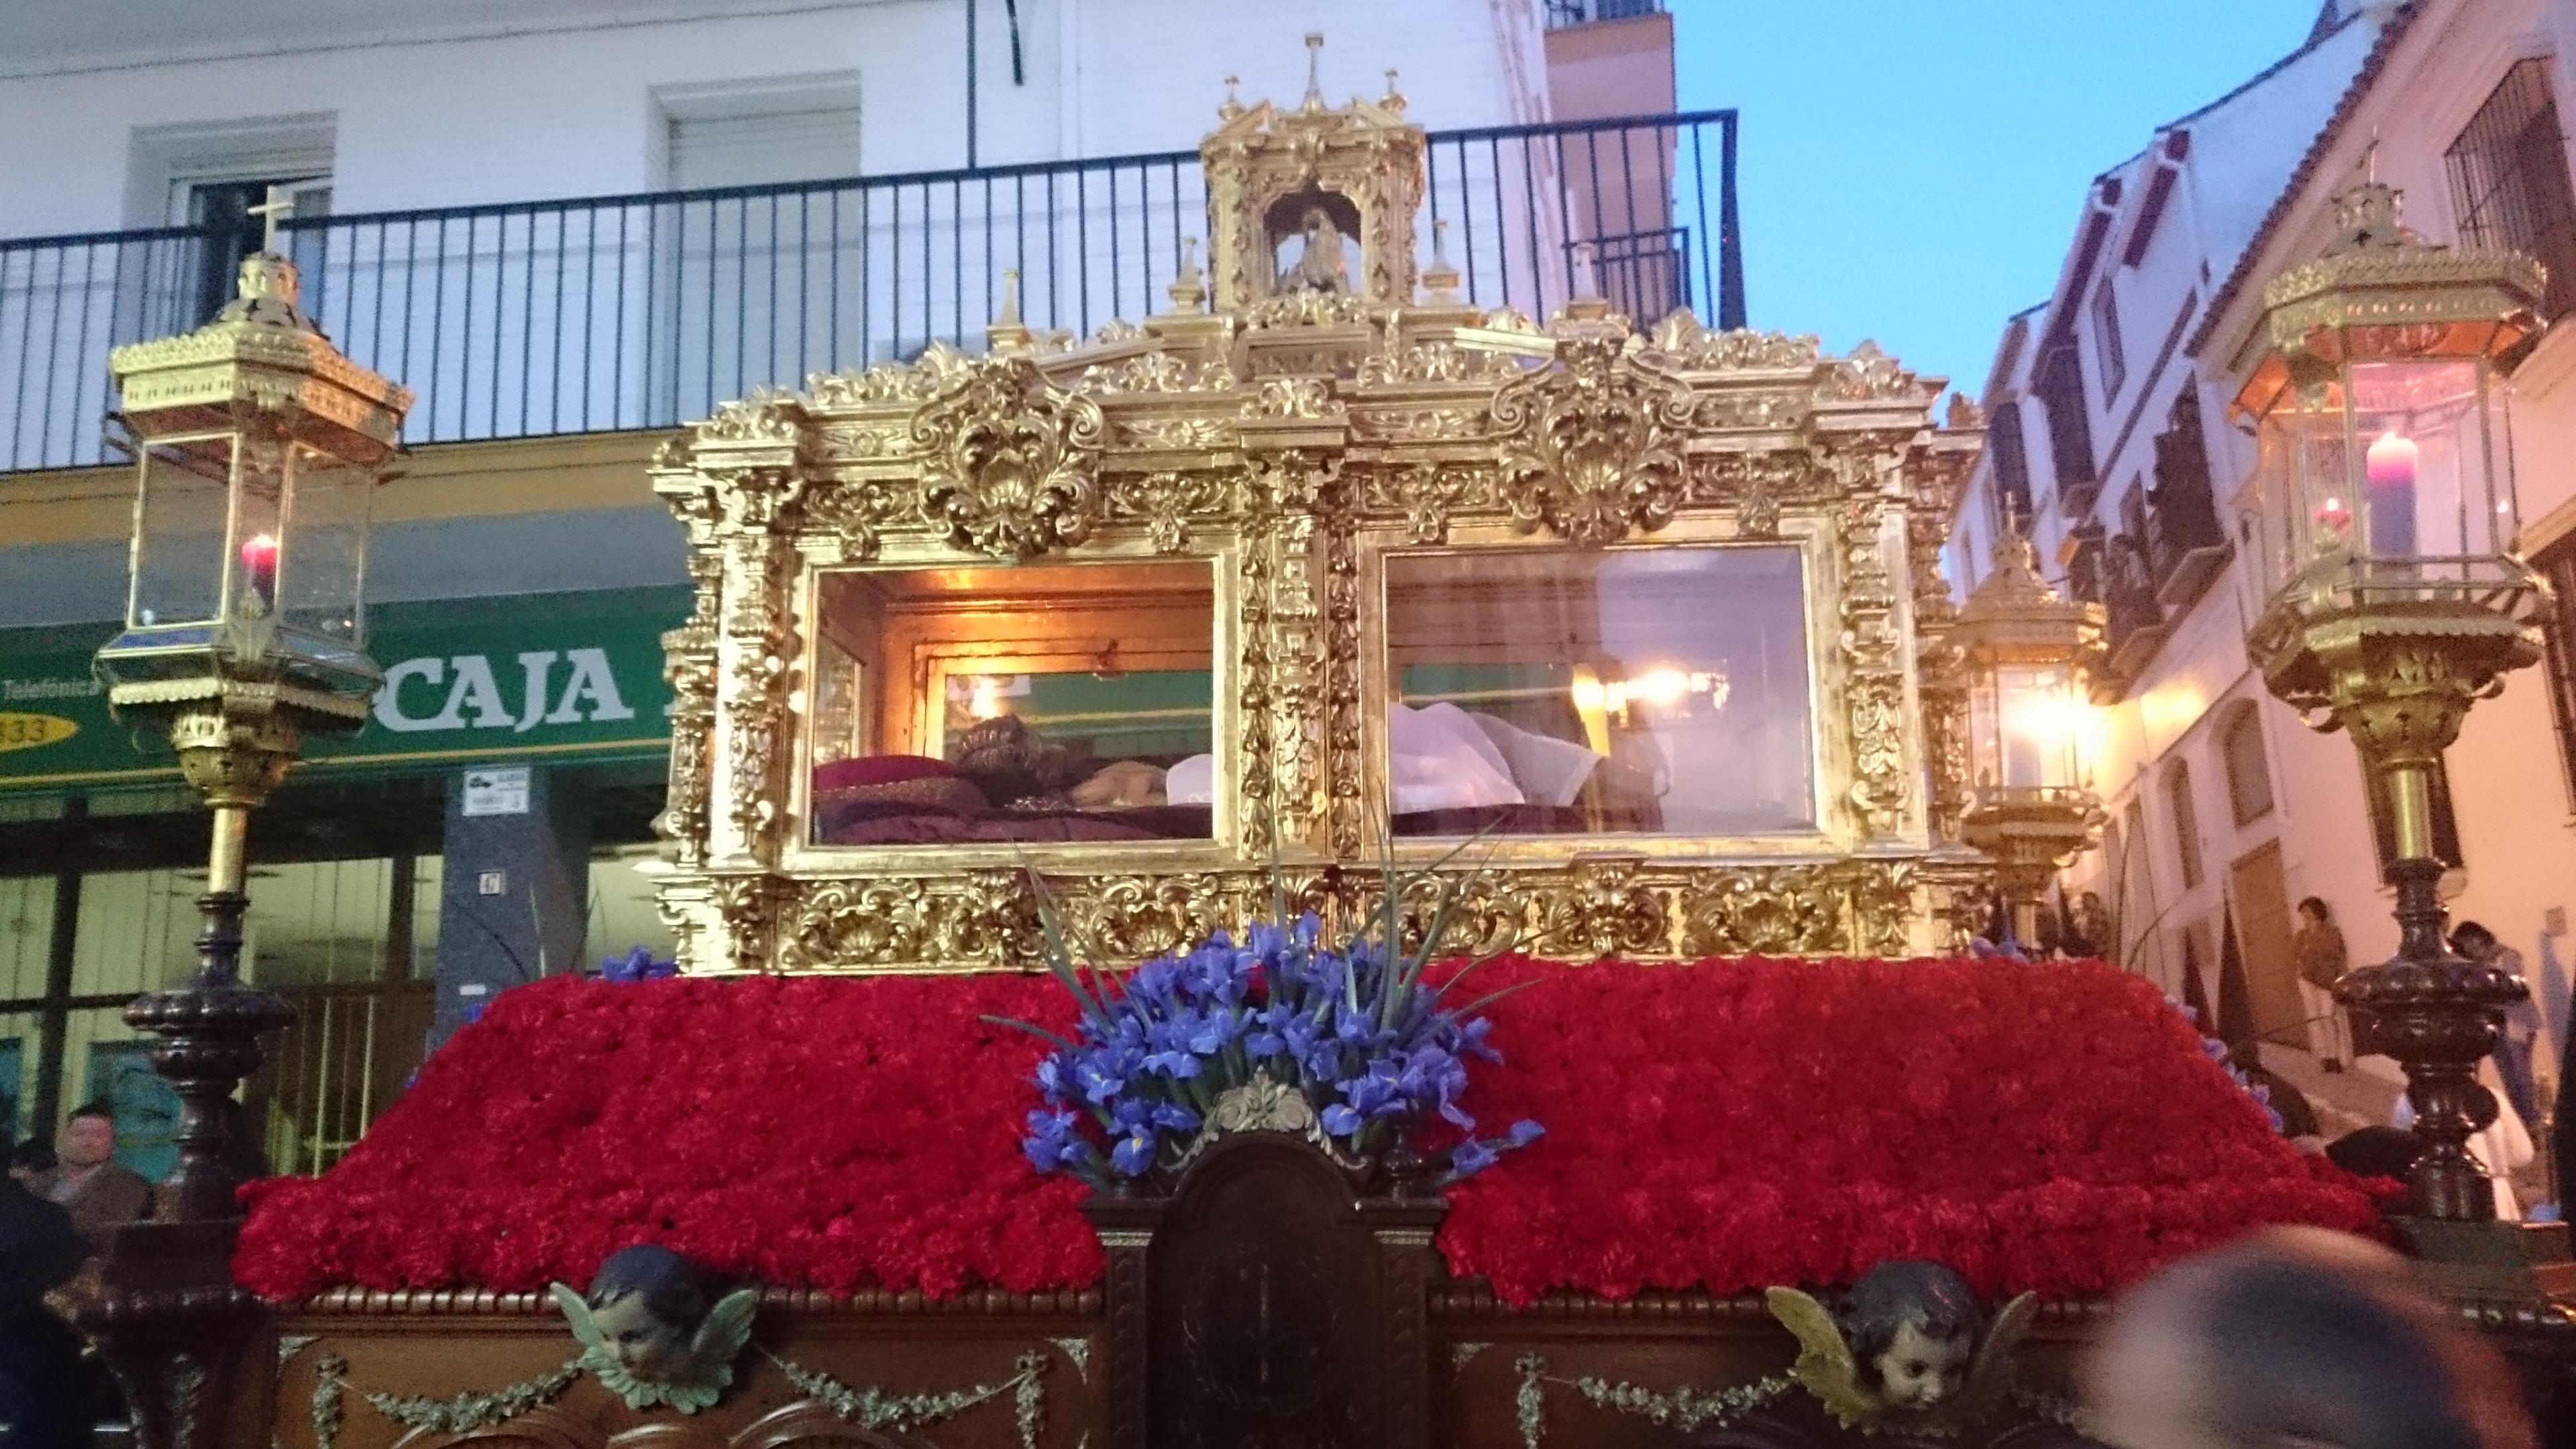 Santo-Entierro-estepa-sevilla-andalucia-sabado-